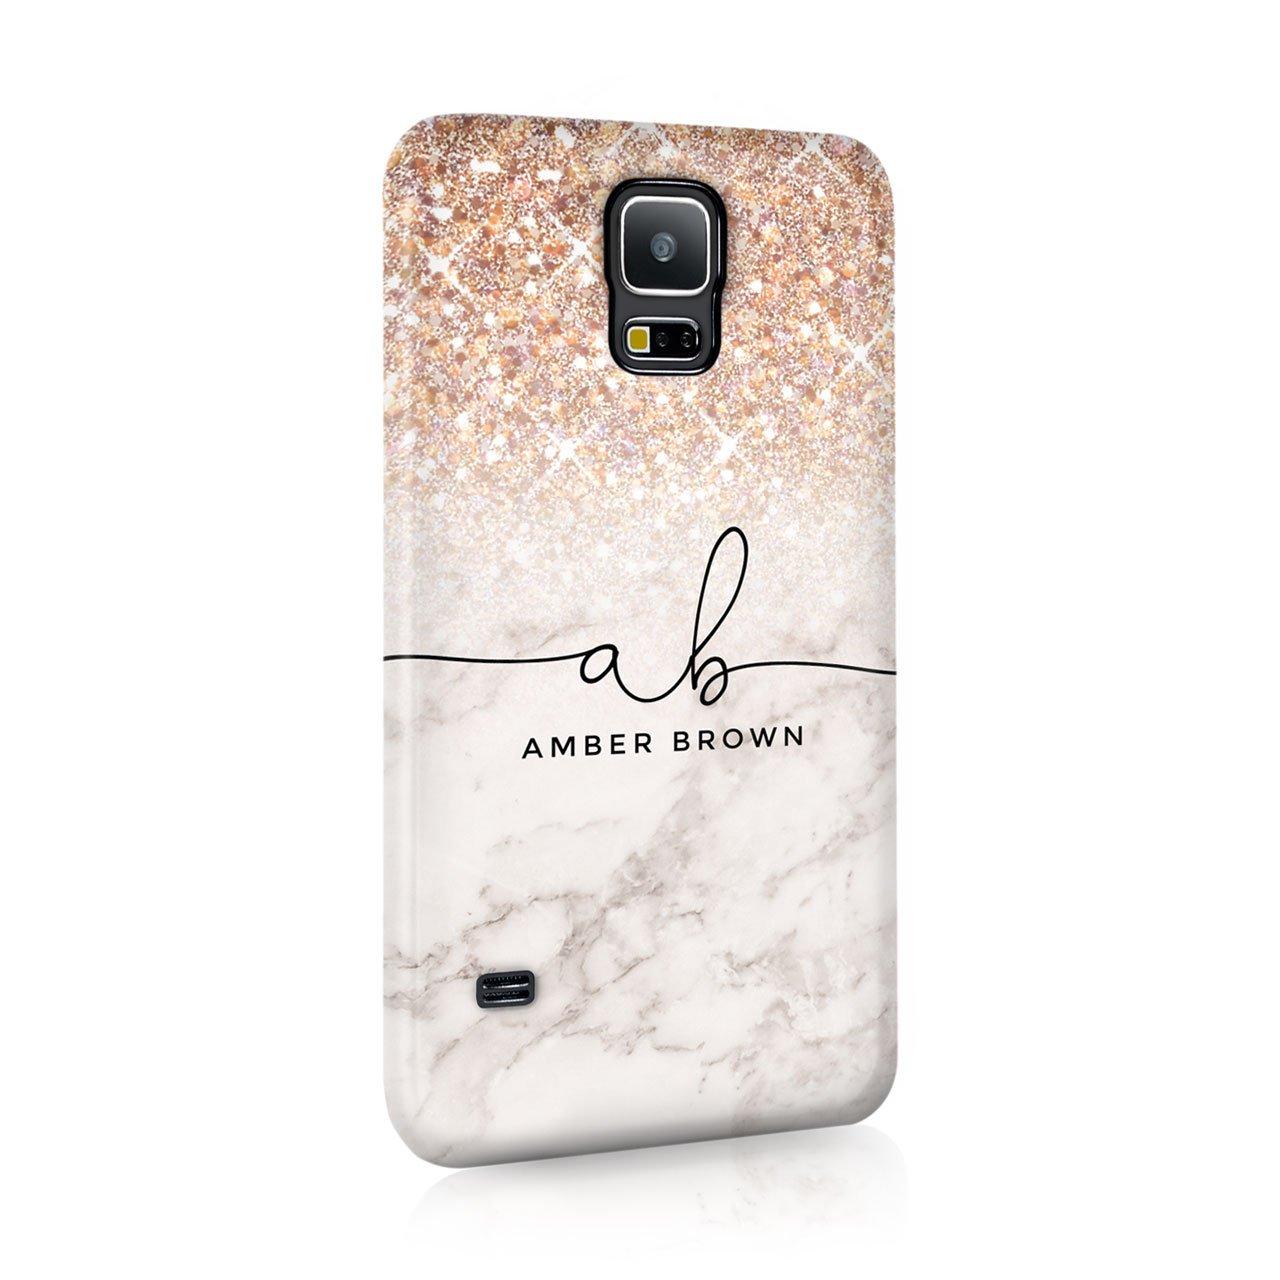 s6 edge plus accessories amazon co ukpersonalised samsung galaxy s6 edge plus tirita hard case cover printed glitter, not real glitter